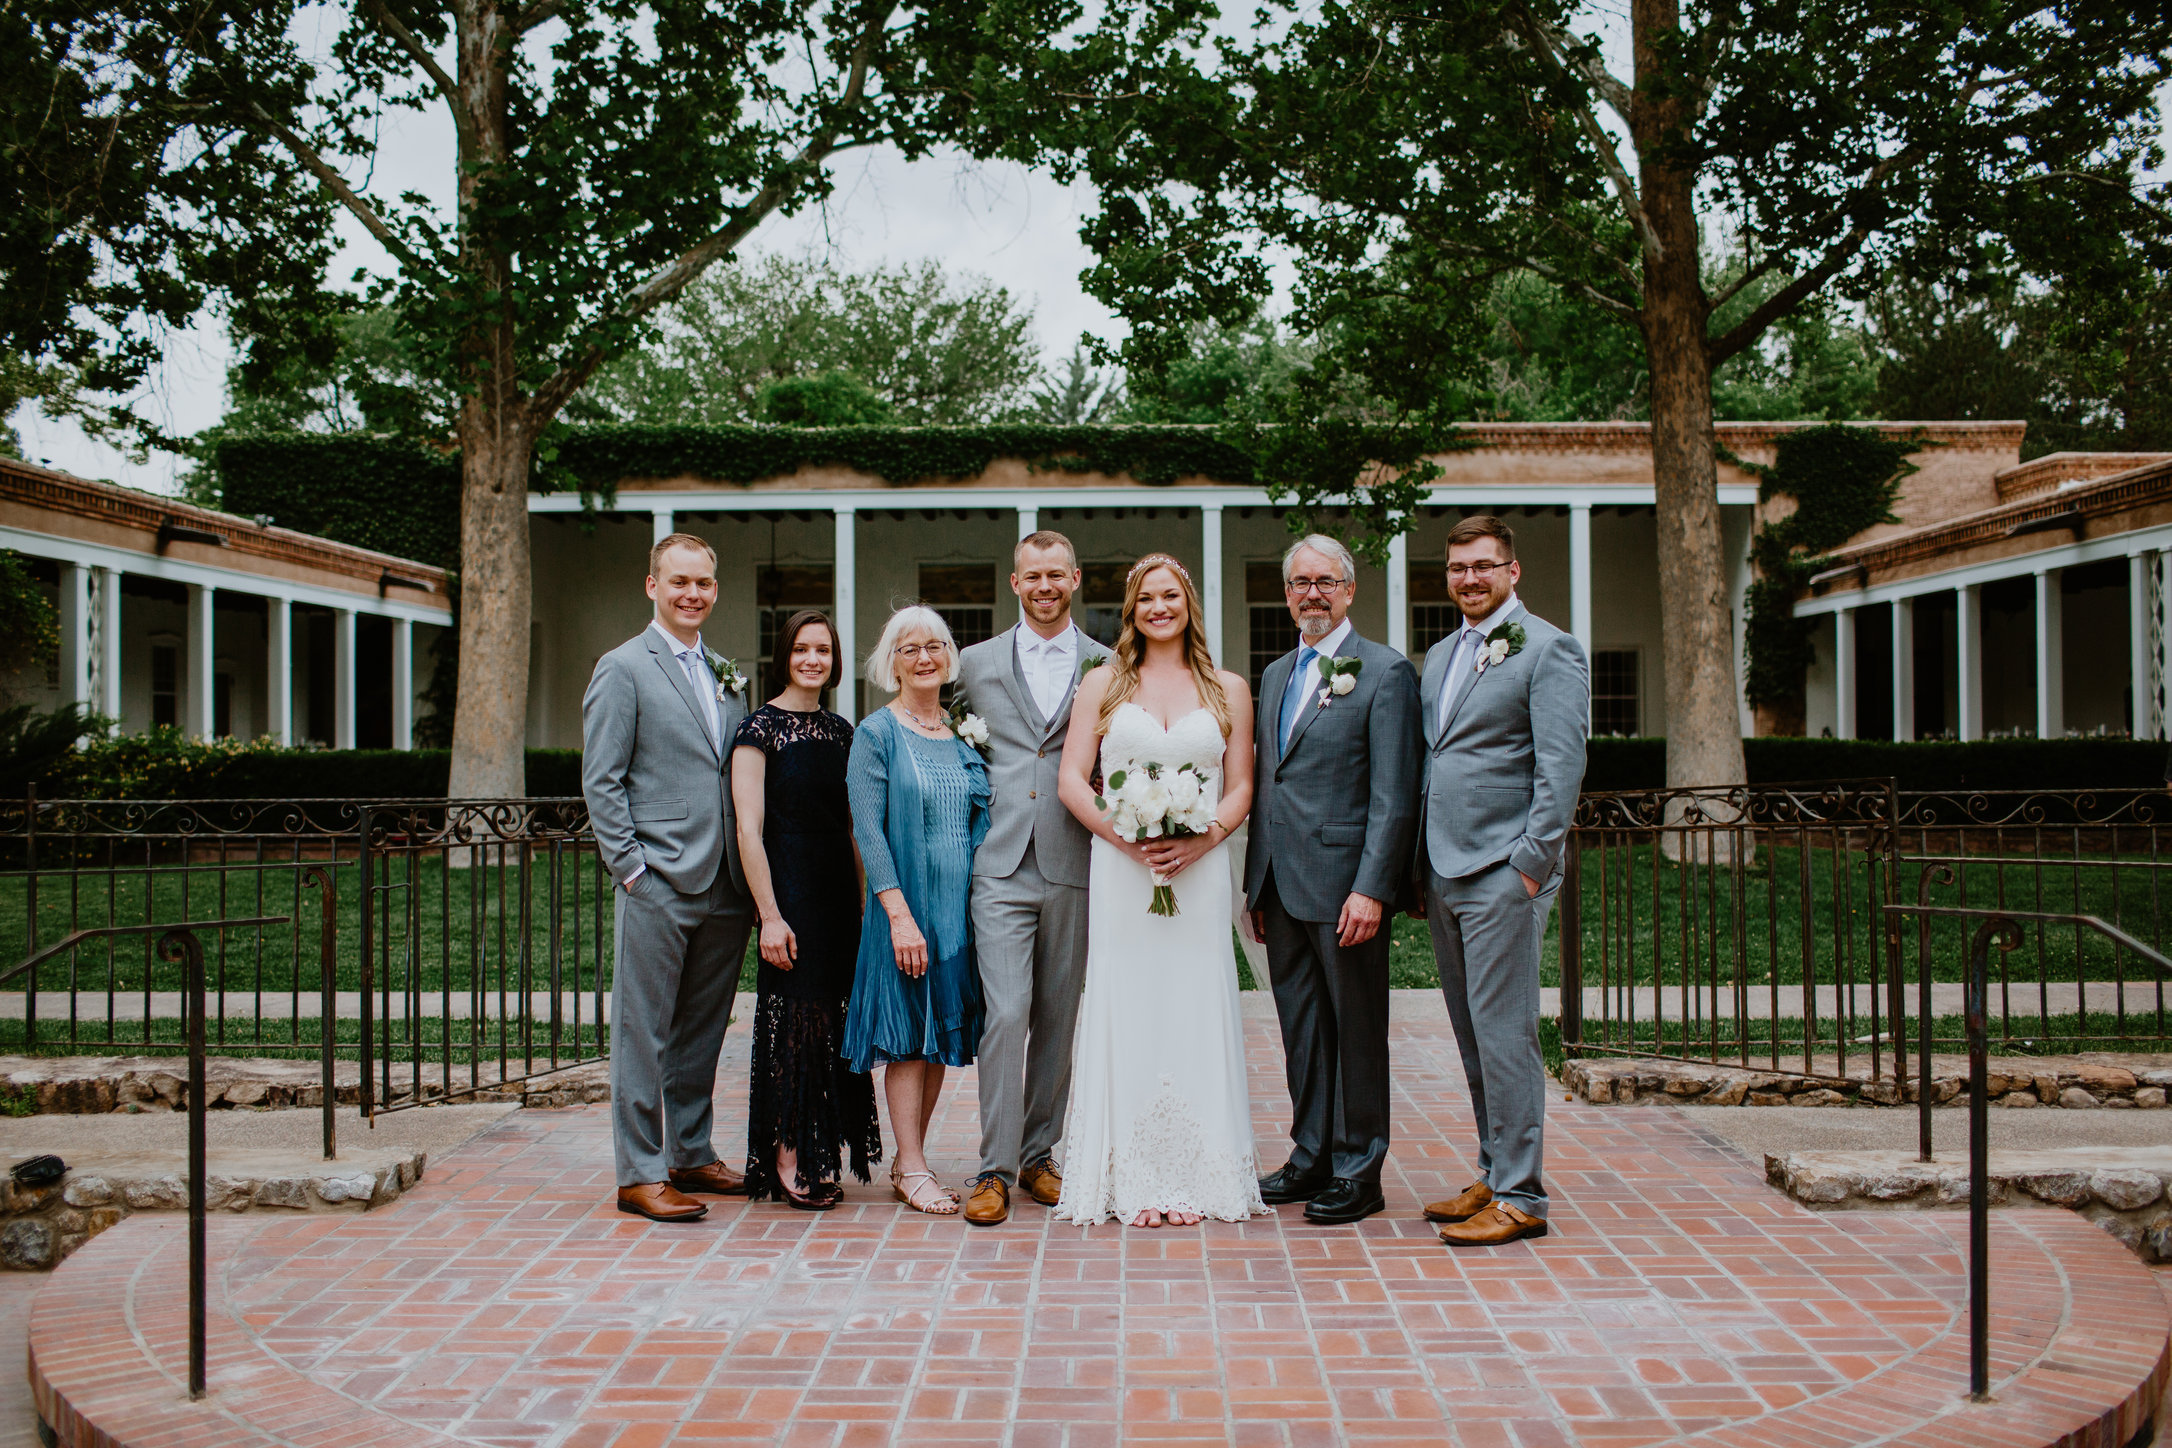 DandA-wedding-482.jpg